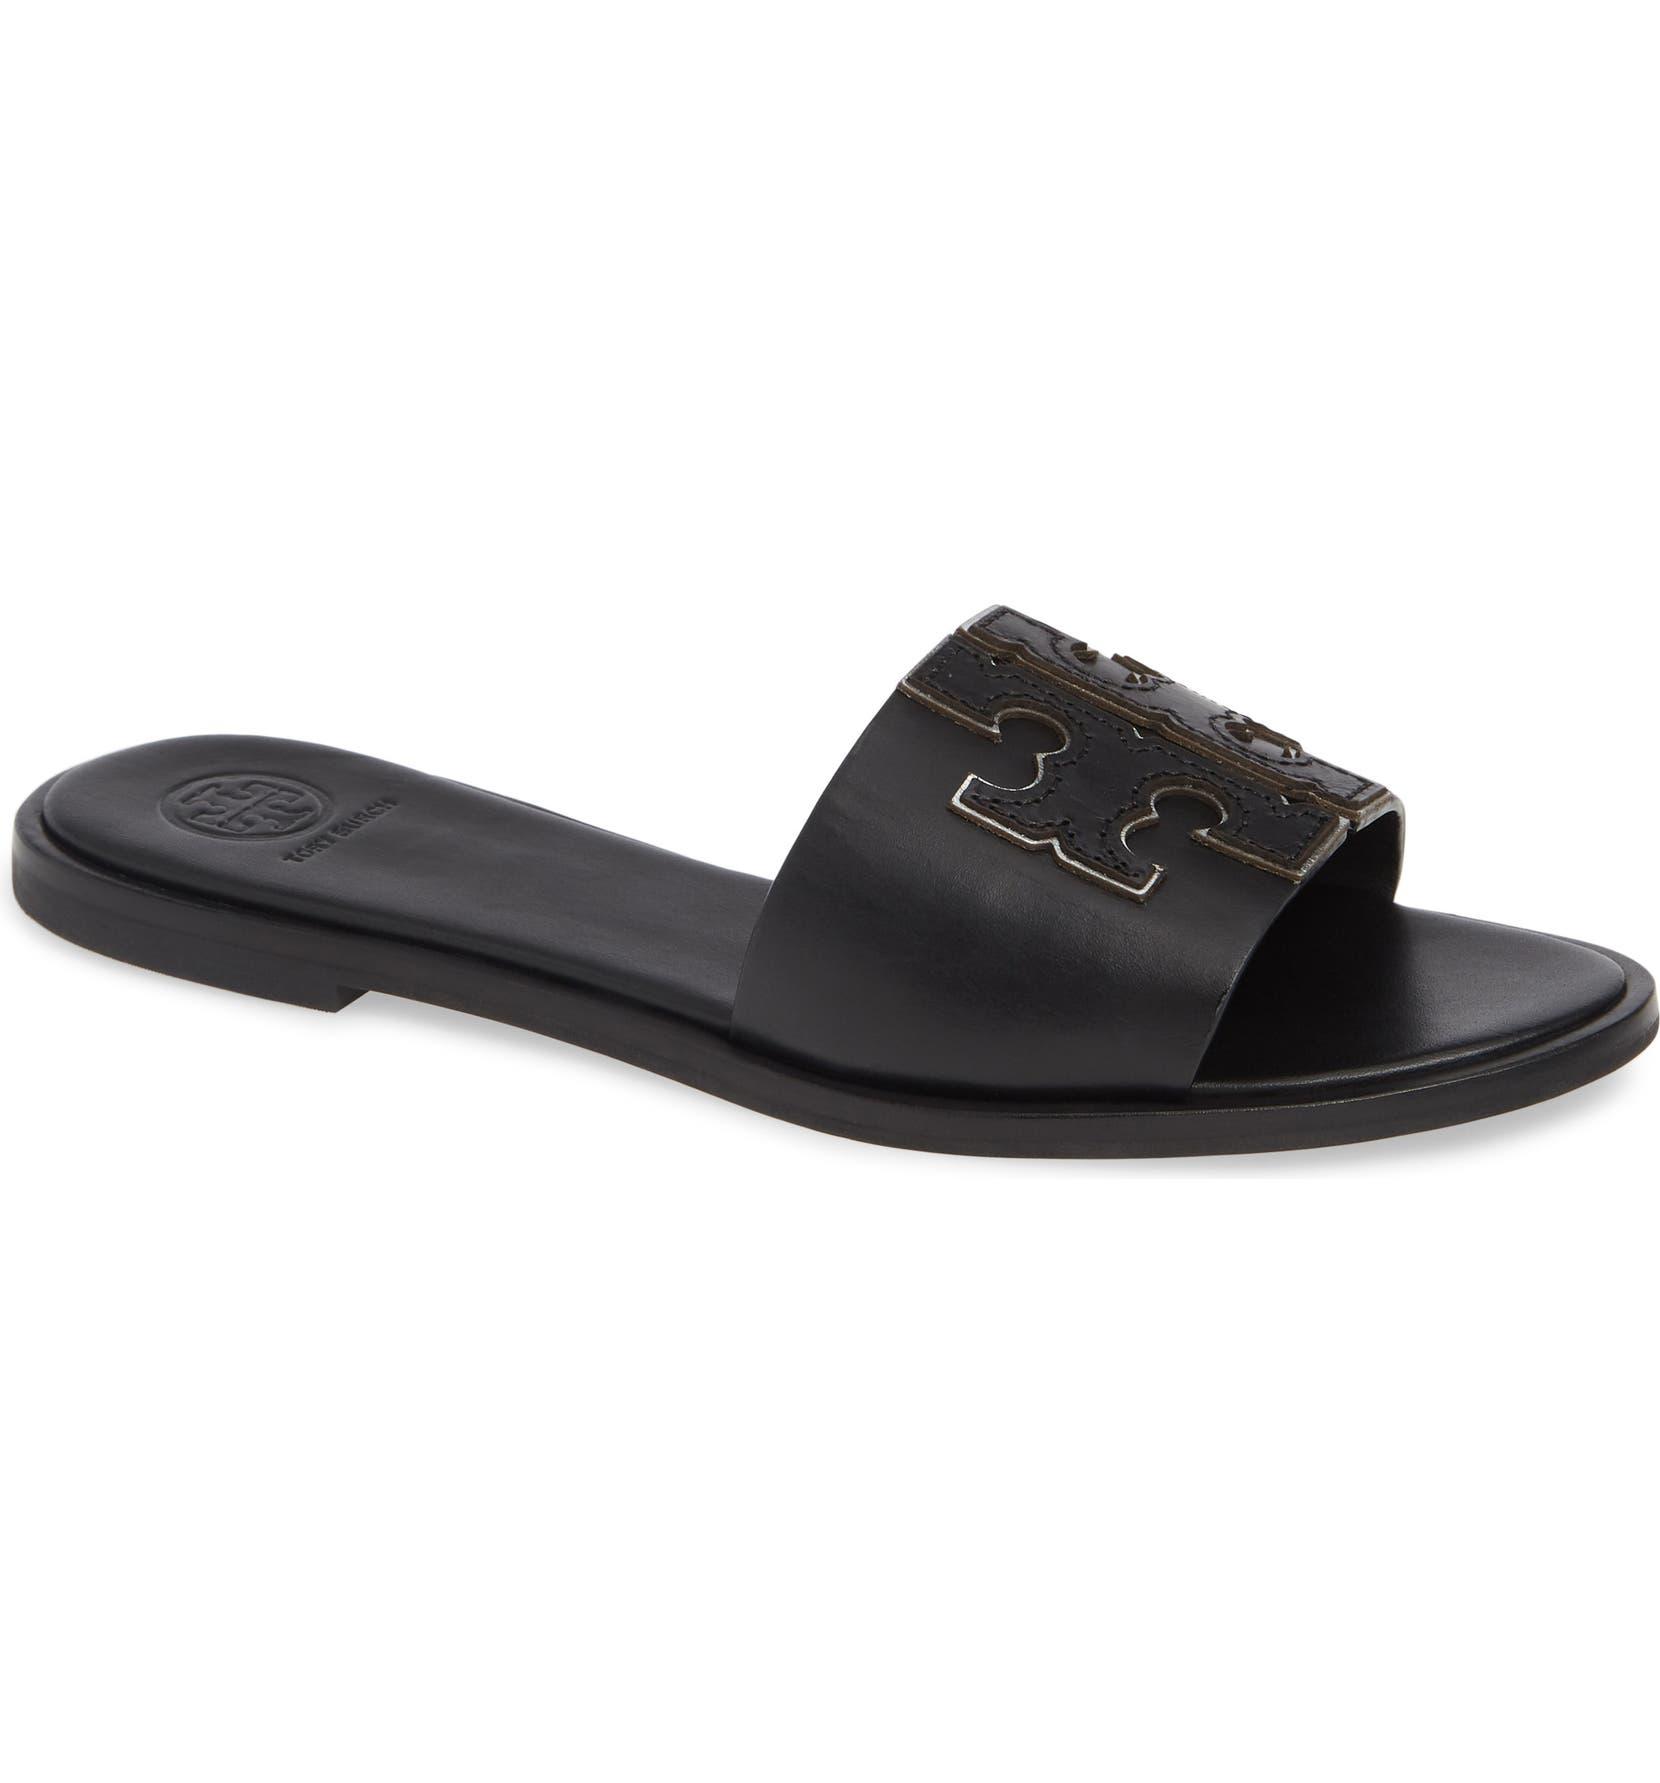 e7b3a7c41 Tory Burch Ines Slide Sandal (Women)